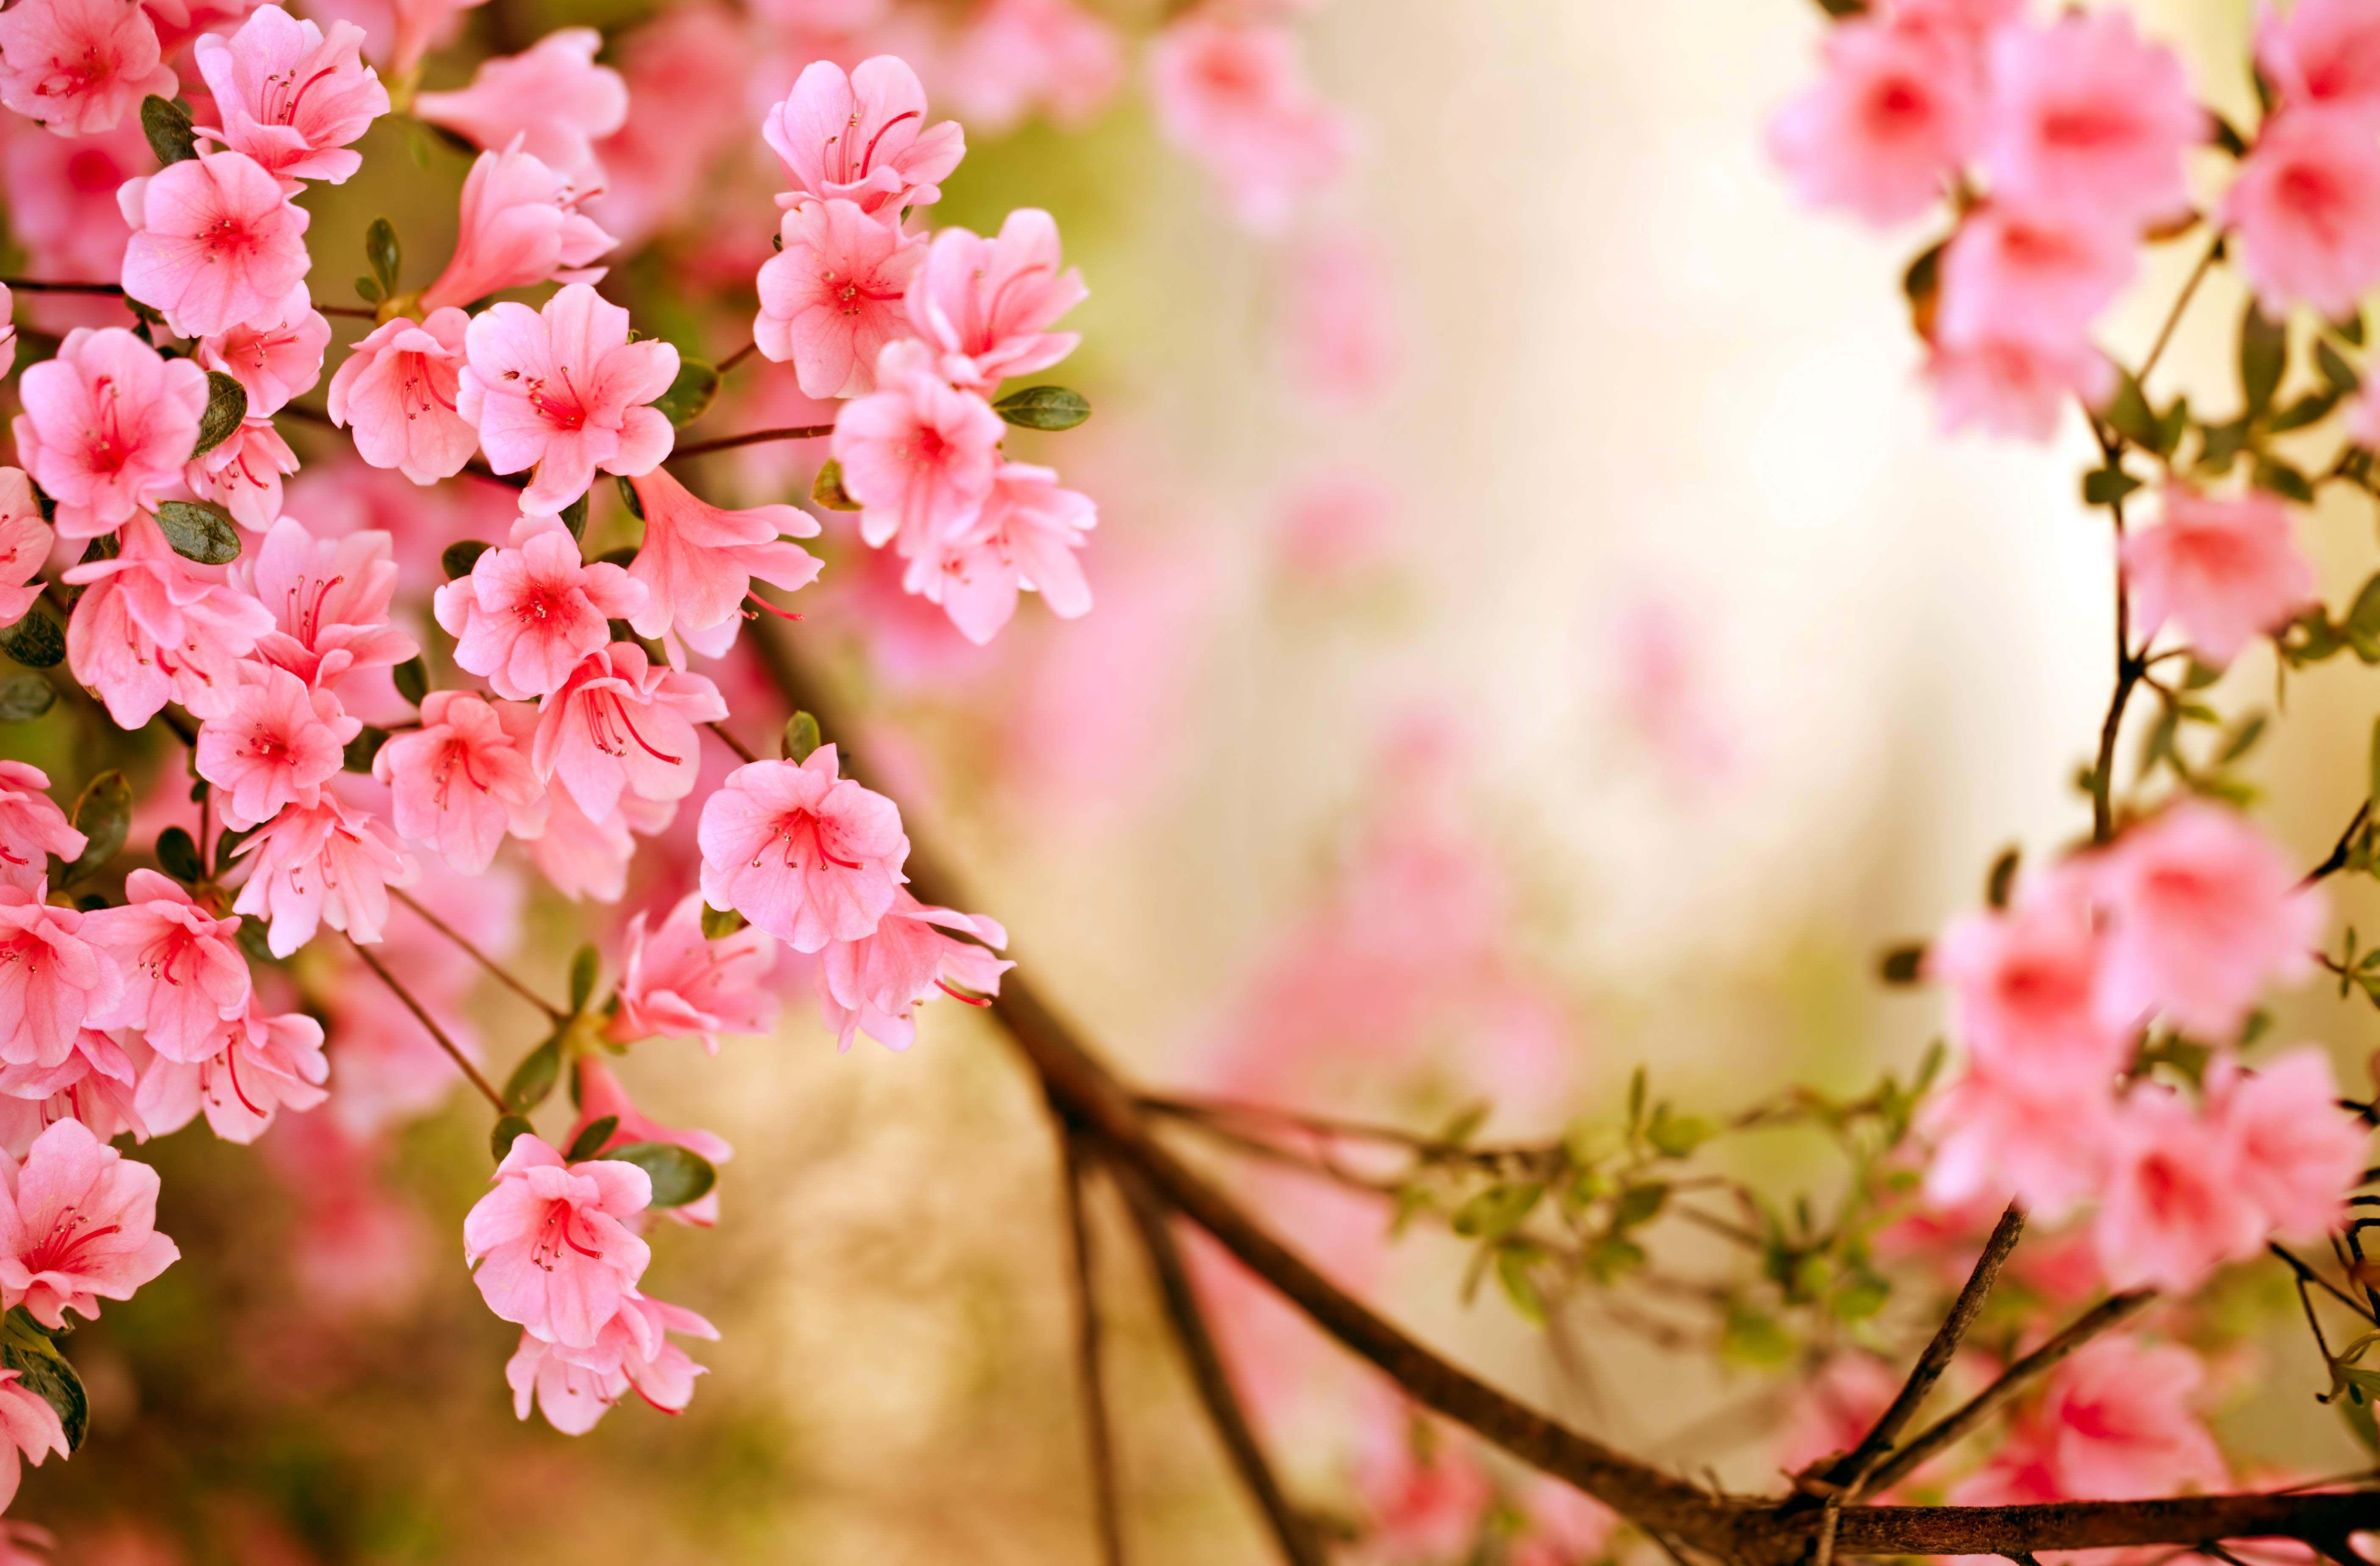 Spring Season Wallpapers Spring flowers images, Spring